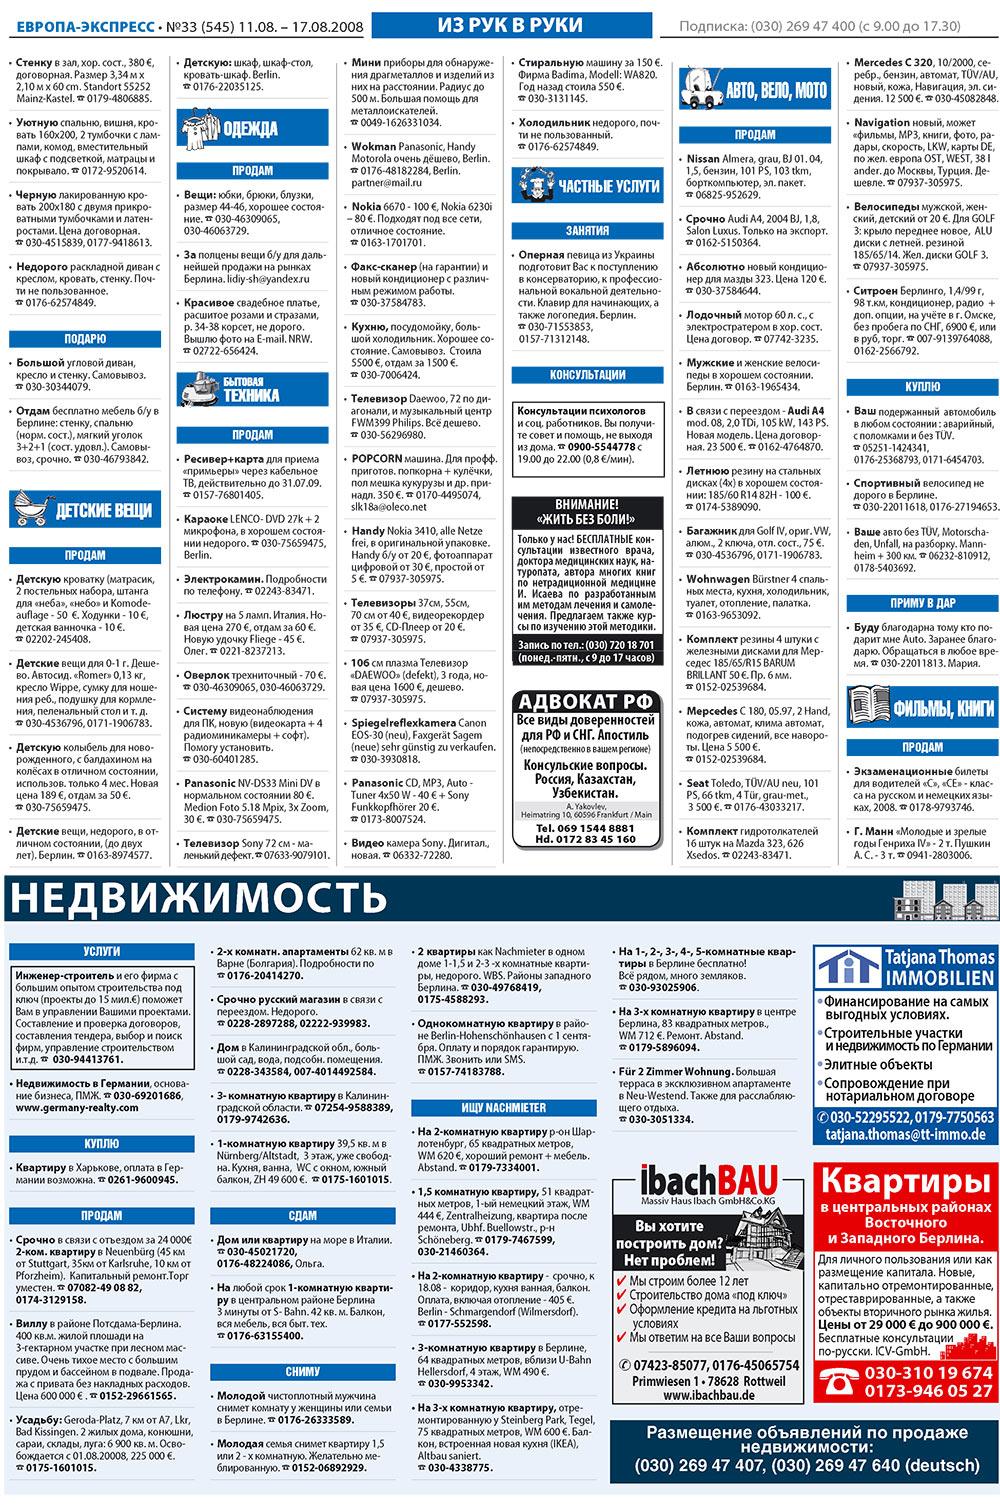 Европа экспресс (газета). 2008 год, номер 33, стр. 19